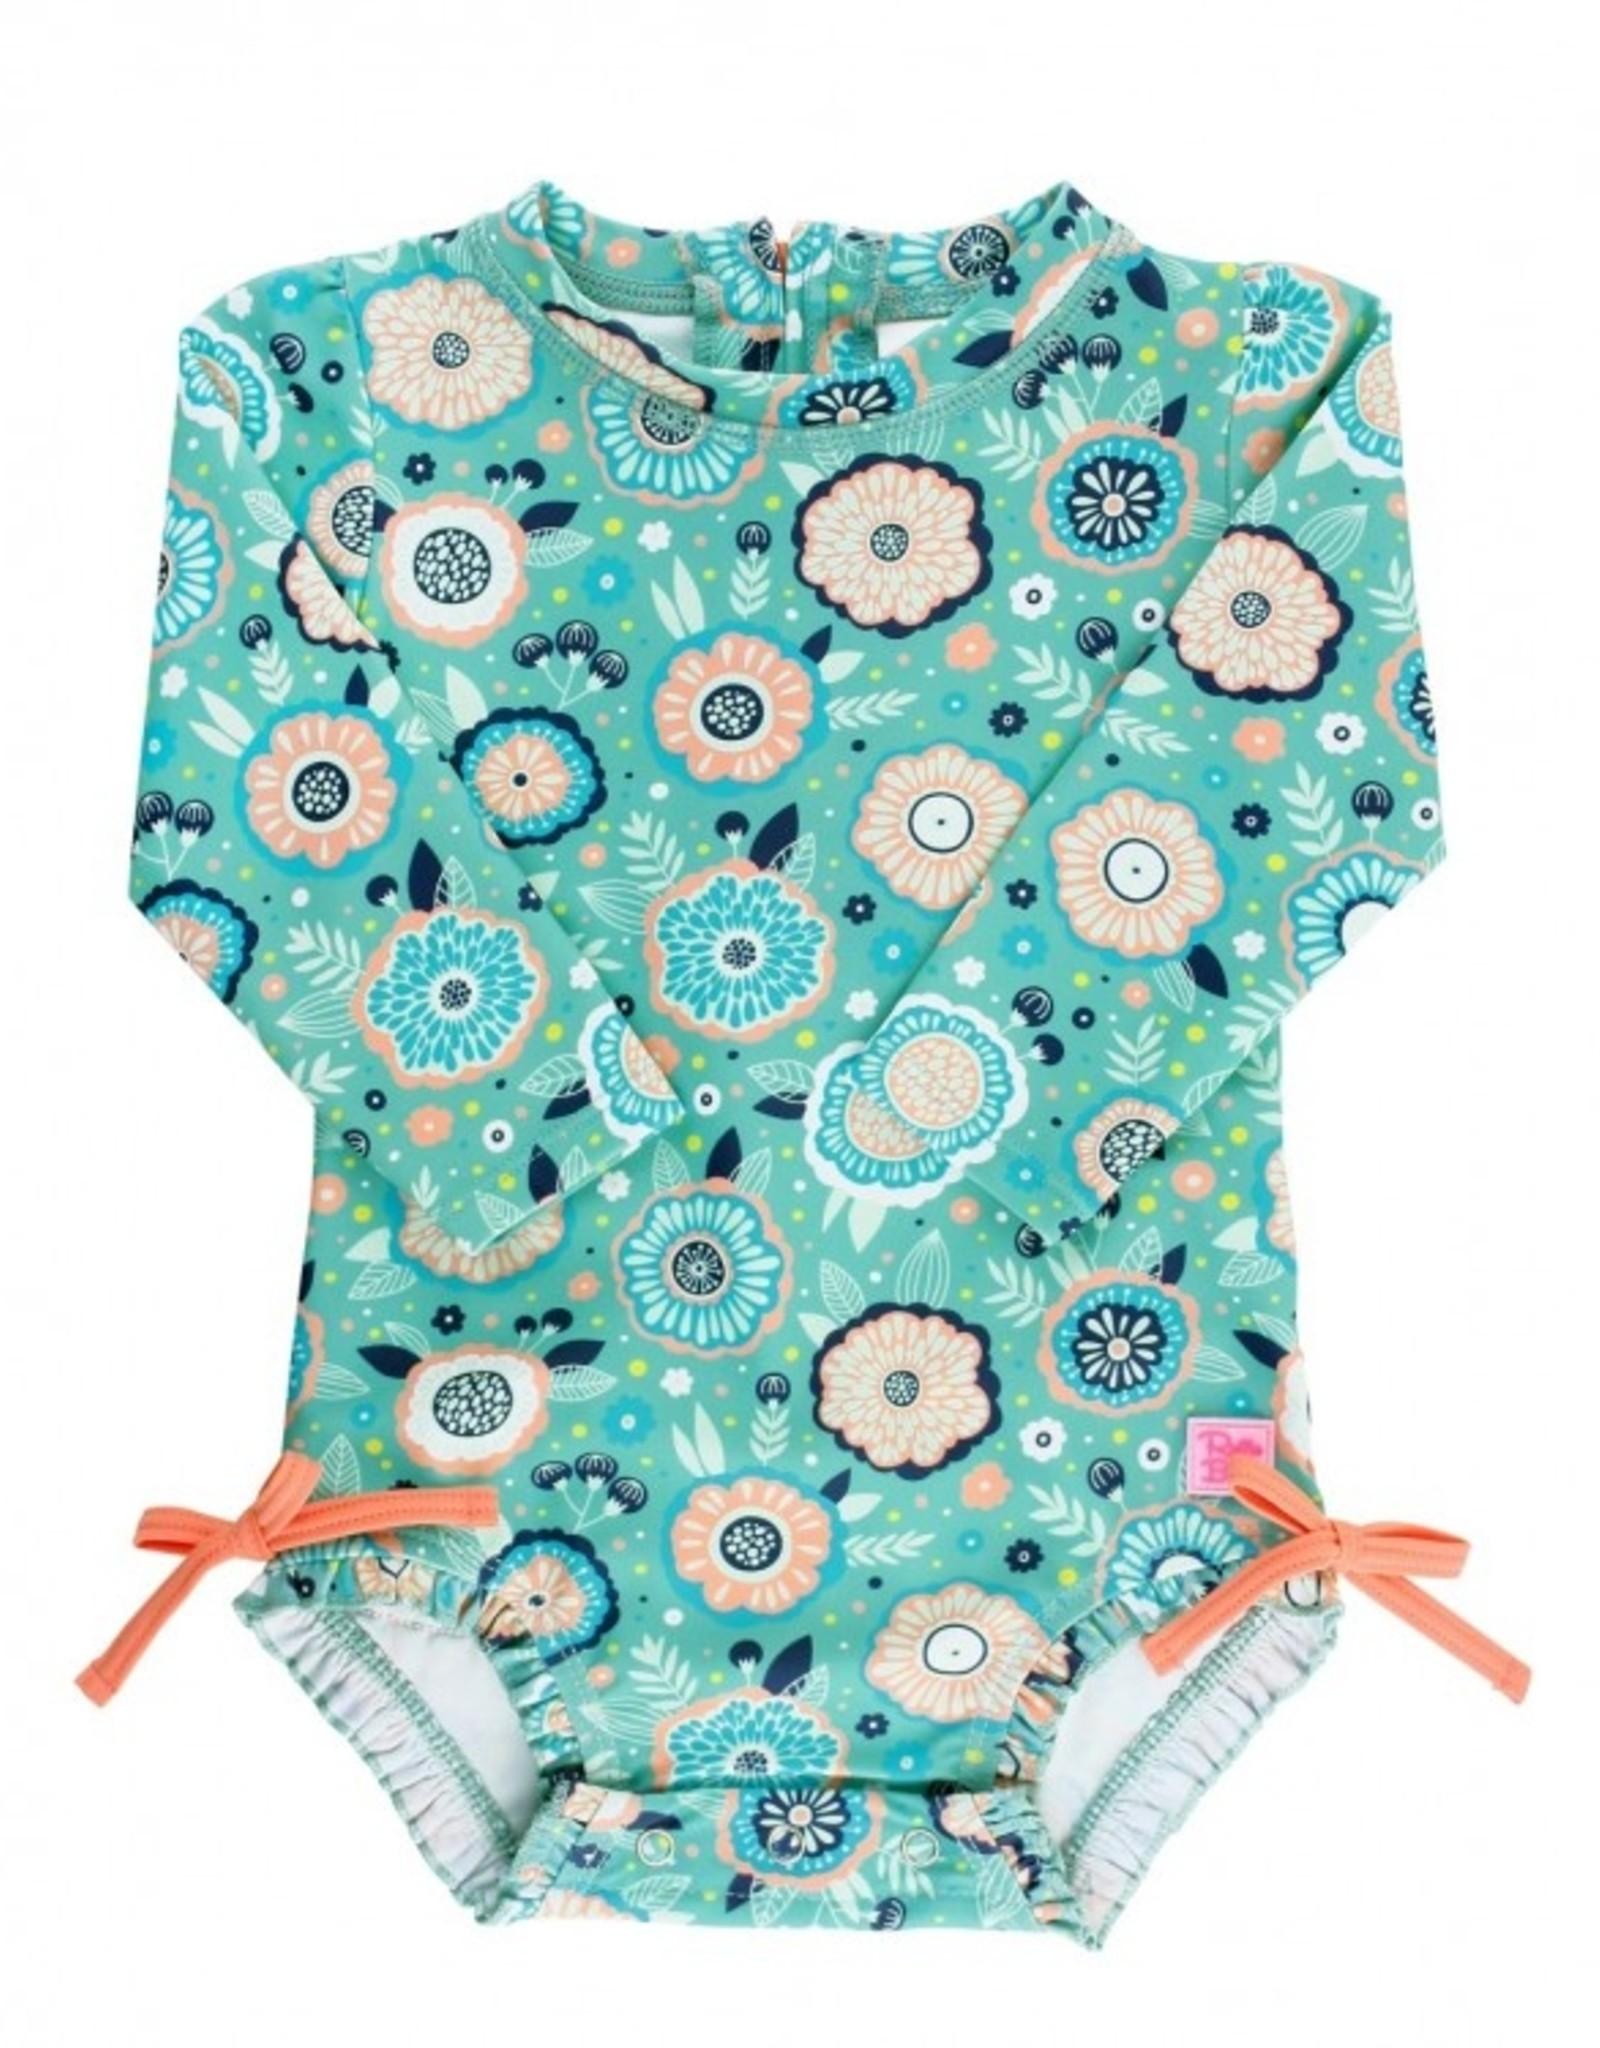 RuffleButts Island Dream 1 pc Rashguard Swimsuit